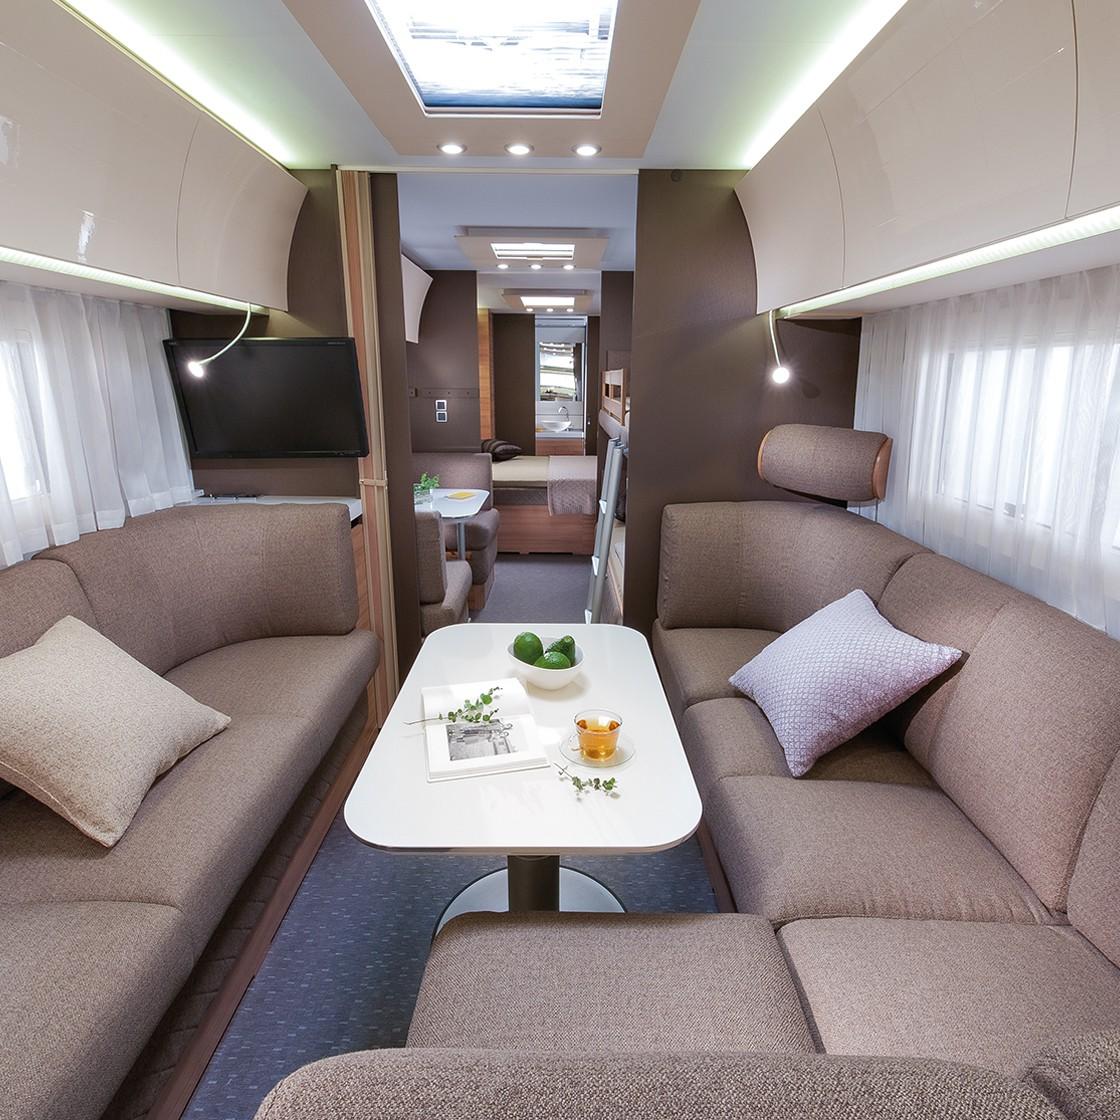 caravan interior design. Black Bedroom Furniture Sets. Home Design Ideas